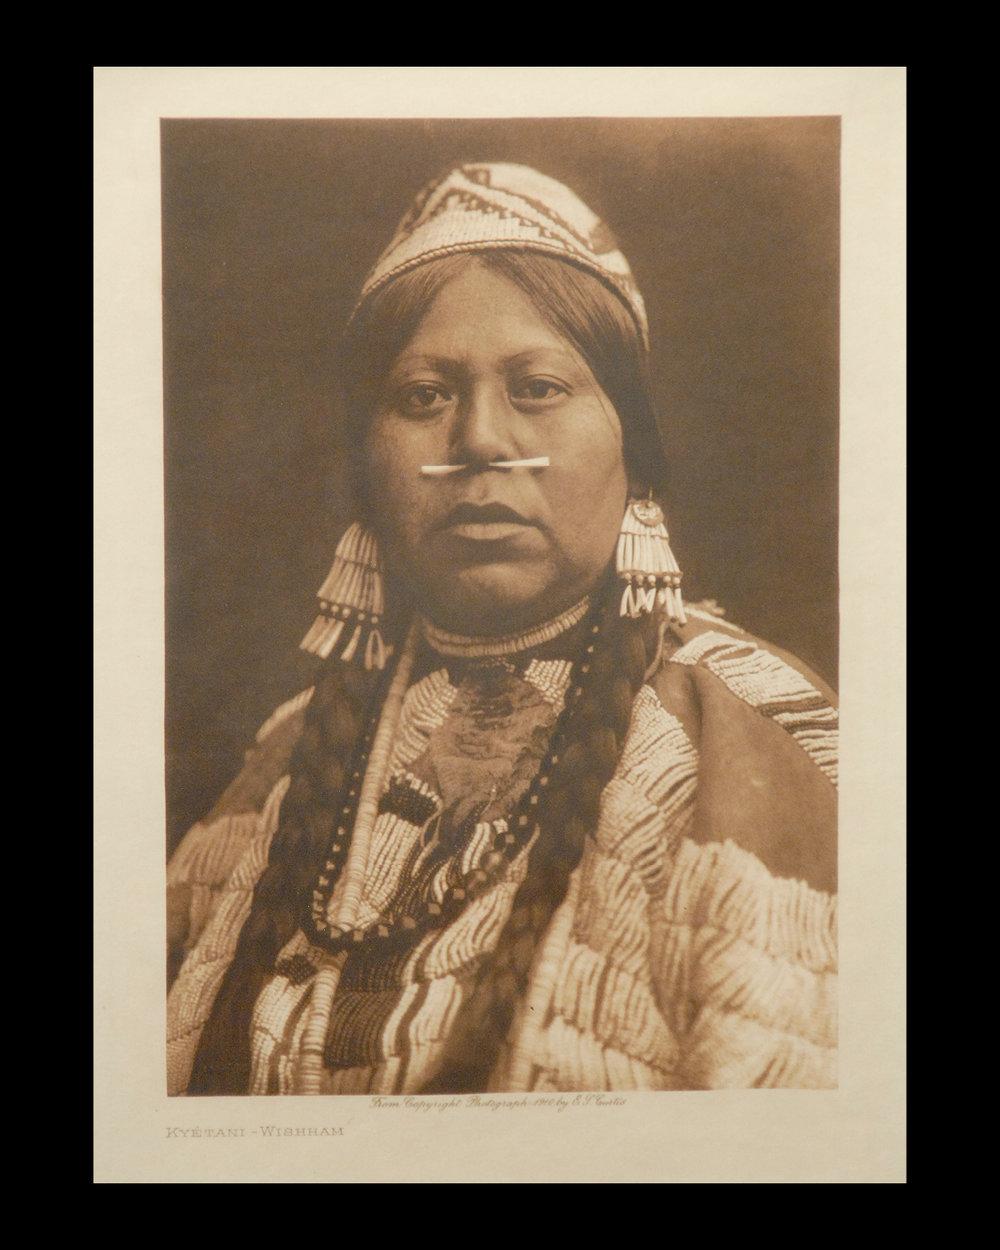 """Kyetani-Wishham"" 1910 Vol.8           Van Gelder Print,Vintage Photogravure"